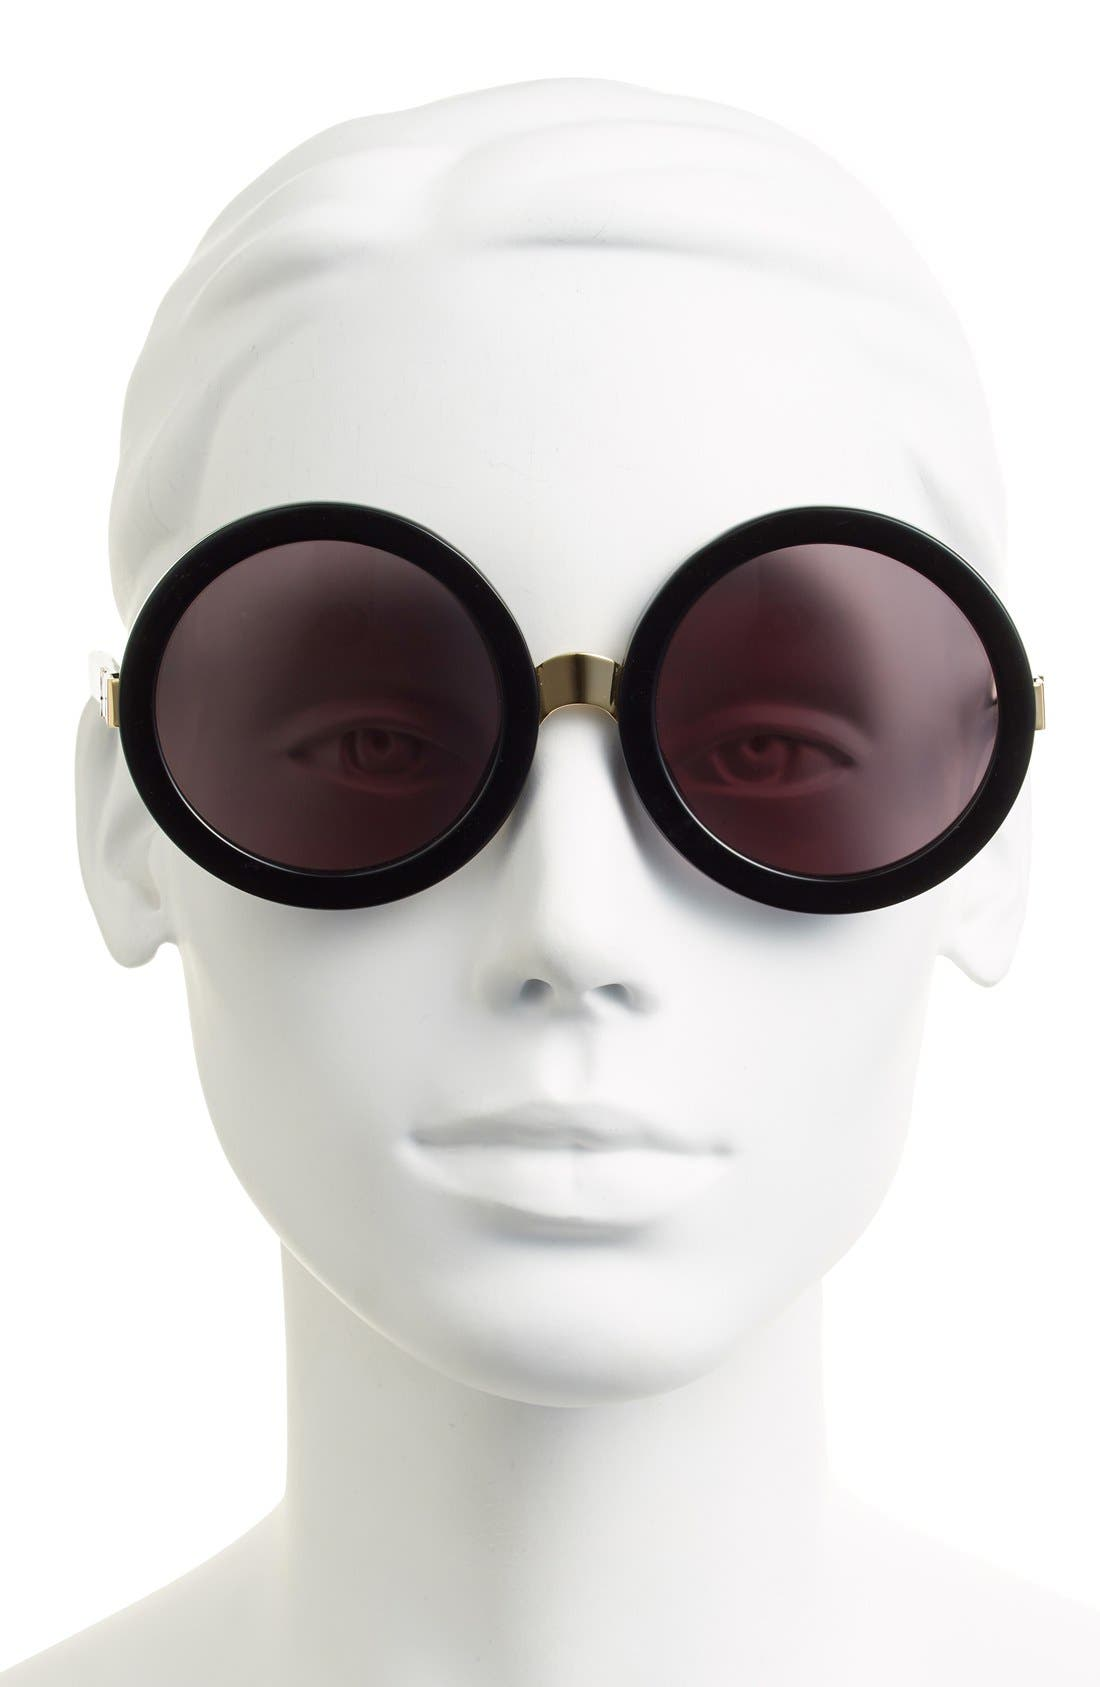 'Malibu' 56mm Round Sunglasses,                             Alternate thumbnail 2, color,                             Black/ Gold/ Grey Gradient